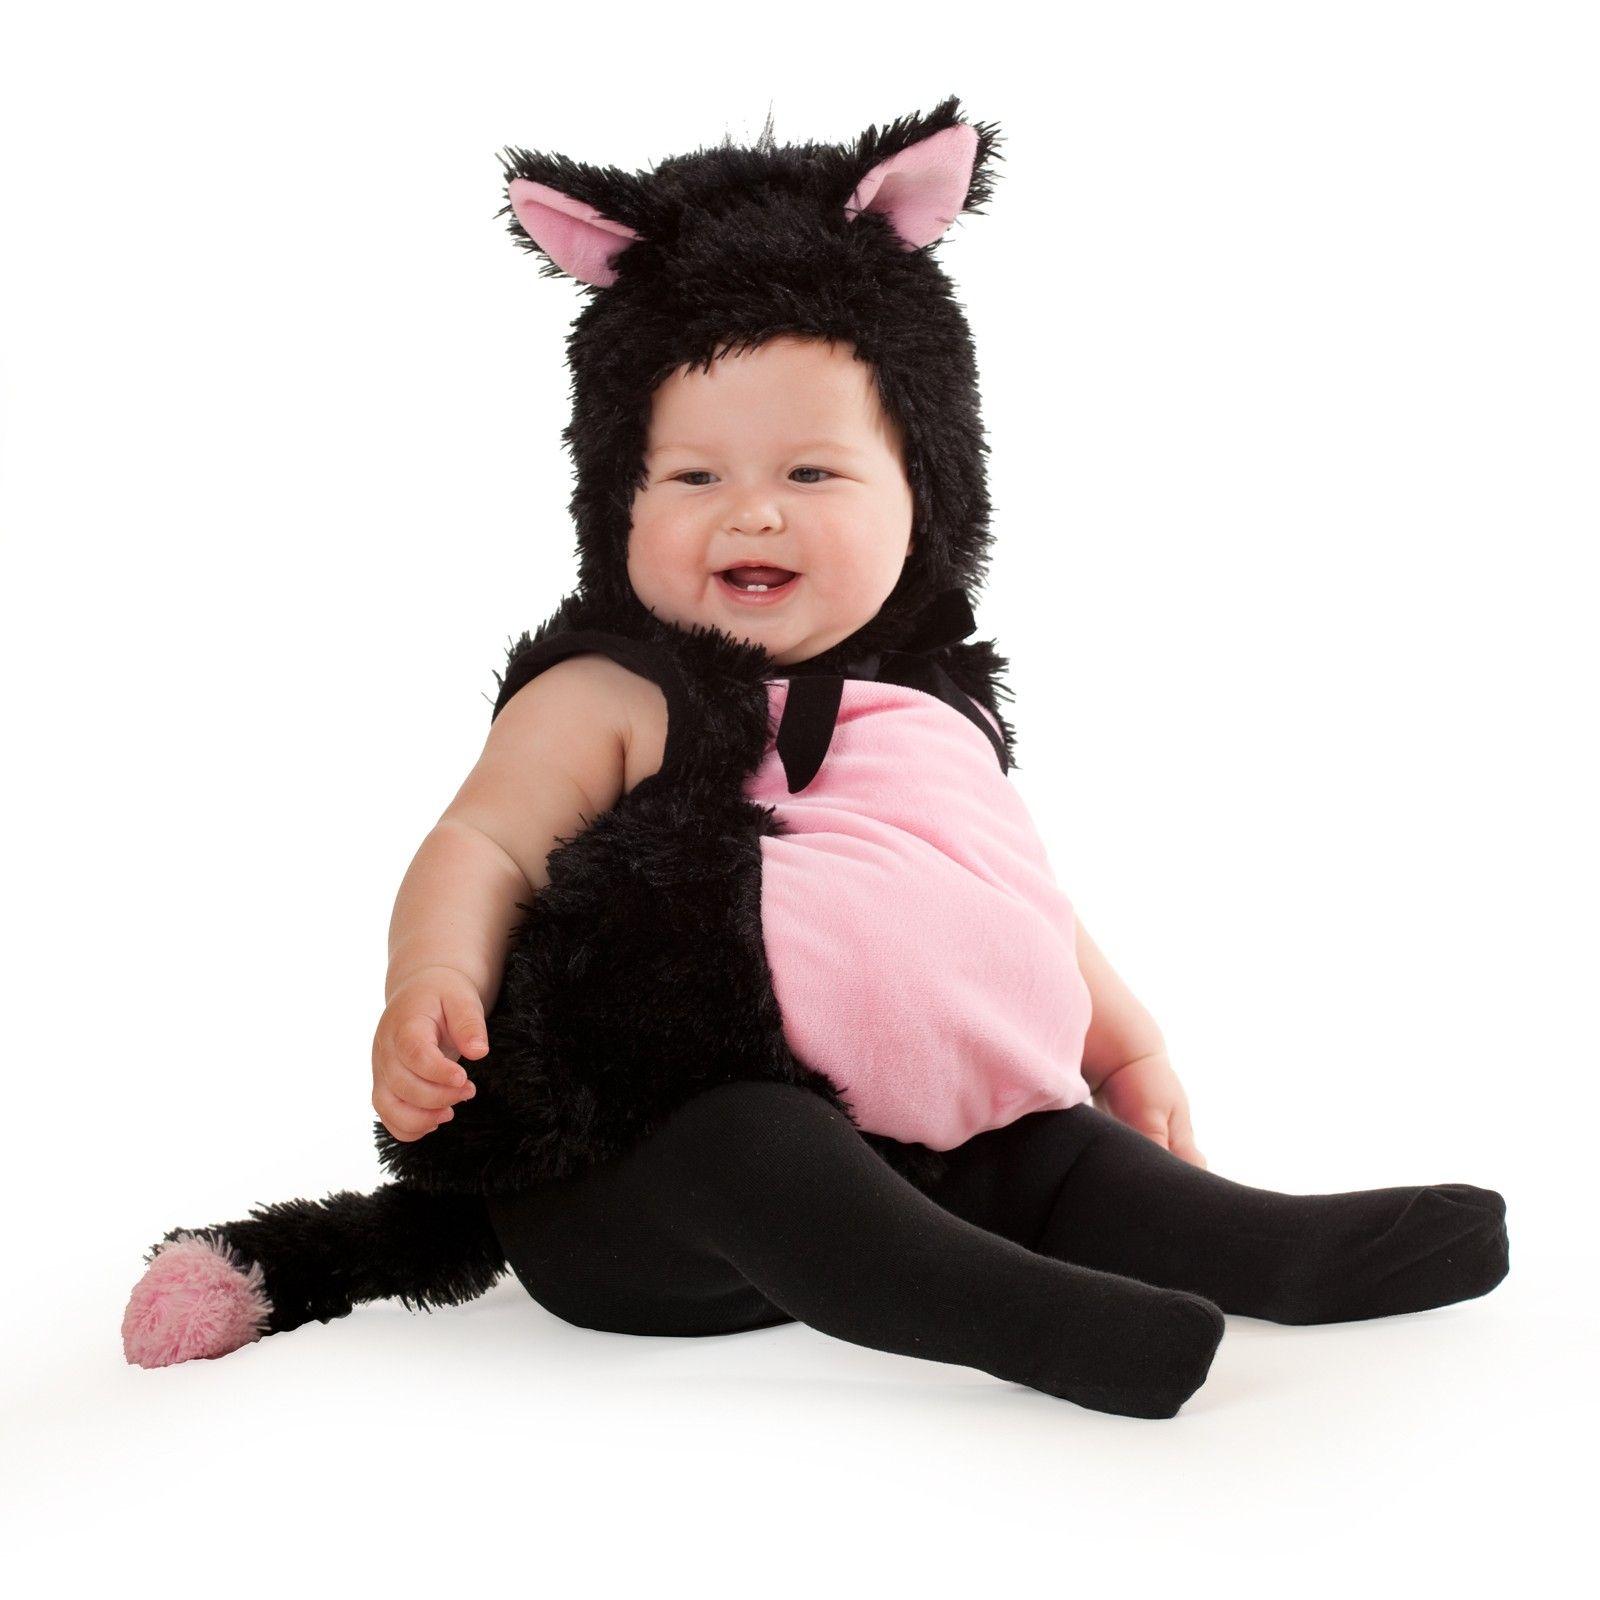 Kitty cat costume  sc 1 st  Pinterest & Kitty cat costume | My kids | Pinterest | Costumes Toddler costumes ...